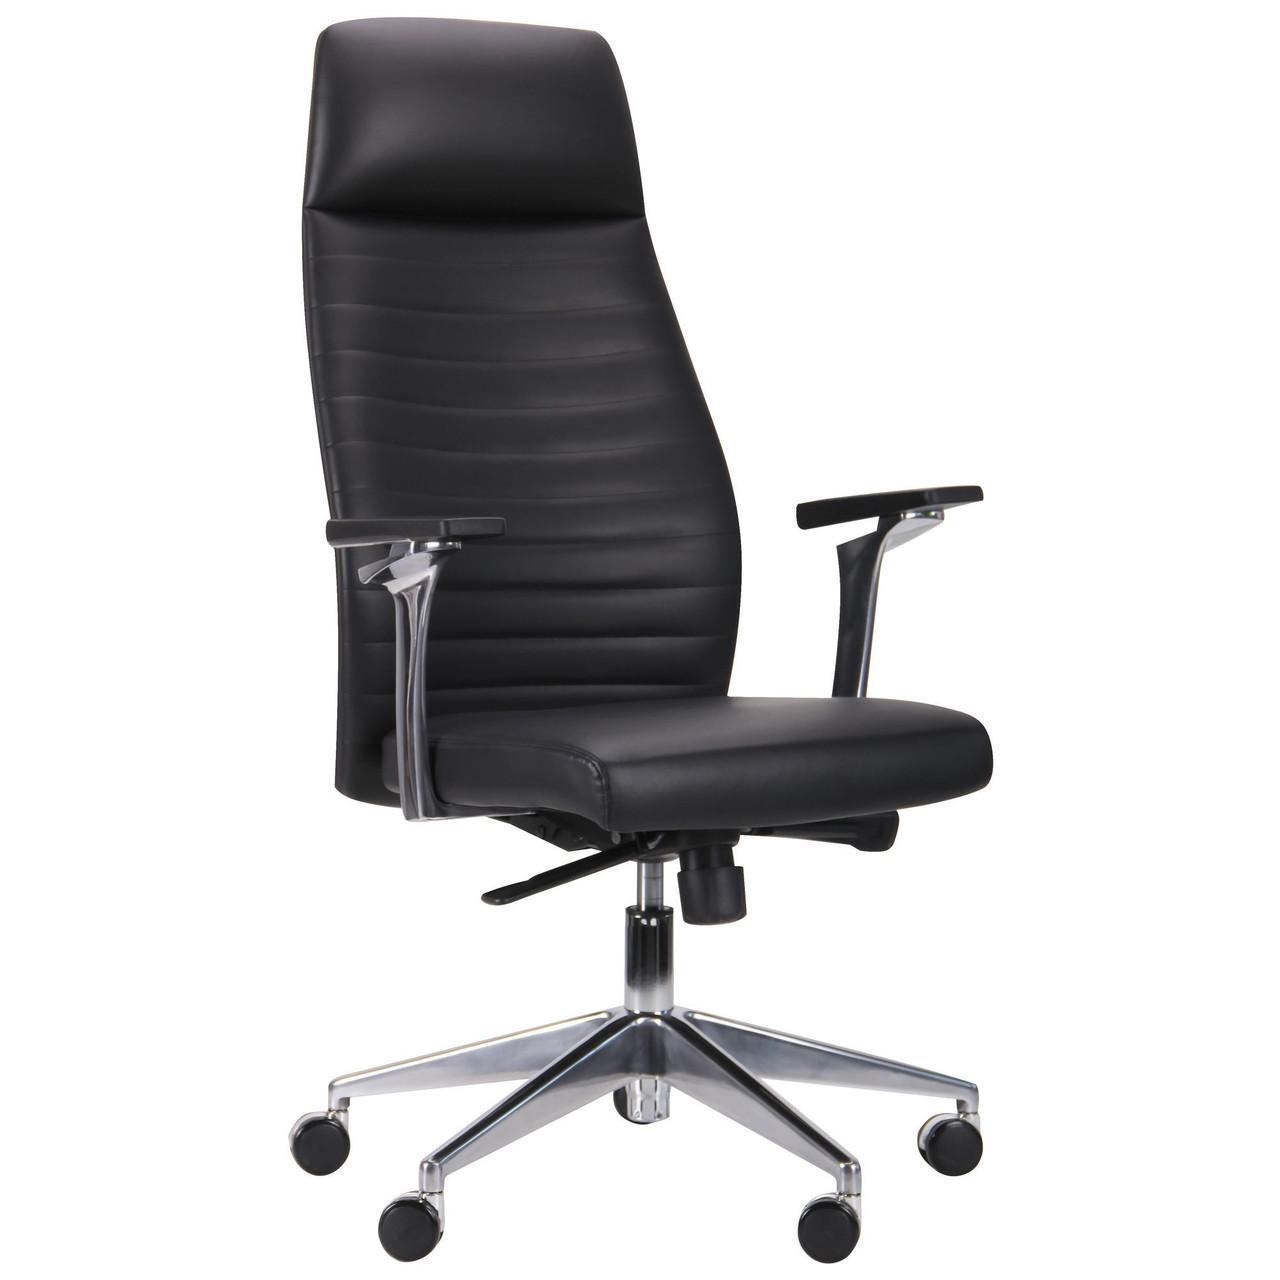 Офисное кресло Ilon HB Black Коллекция Empire, ТМ AMF